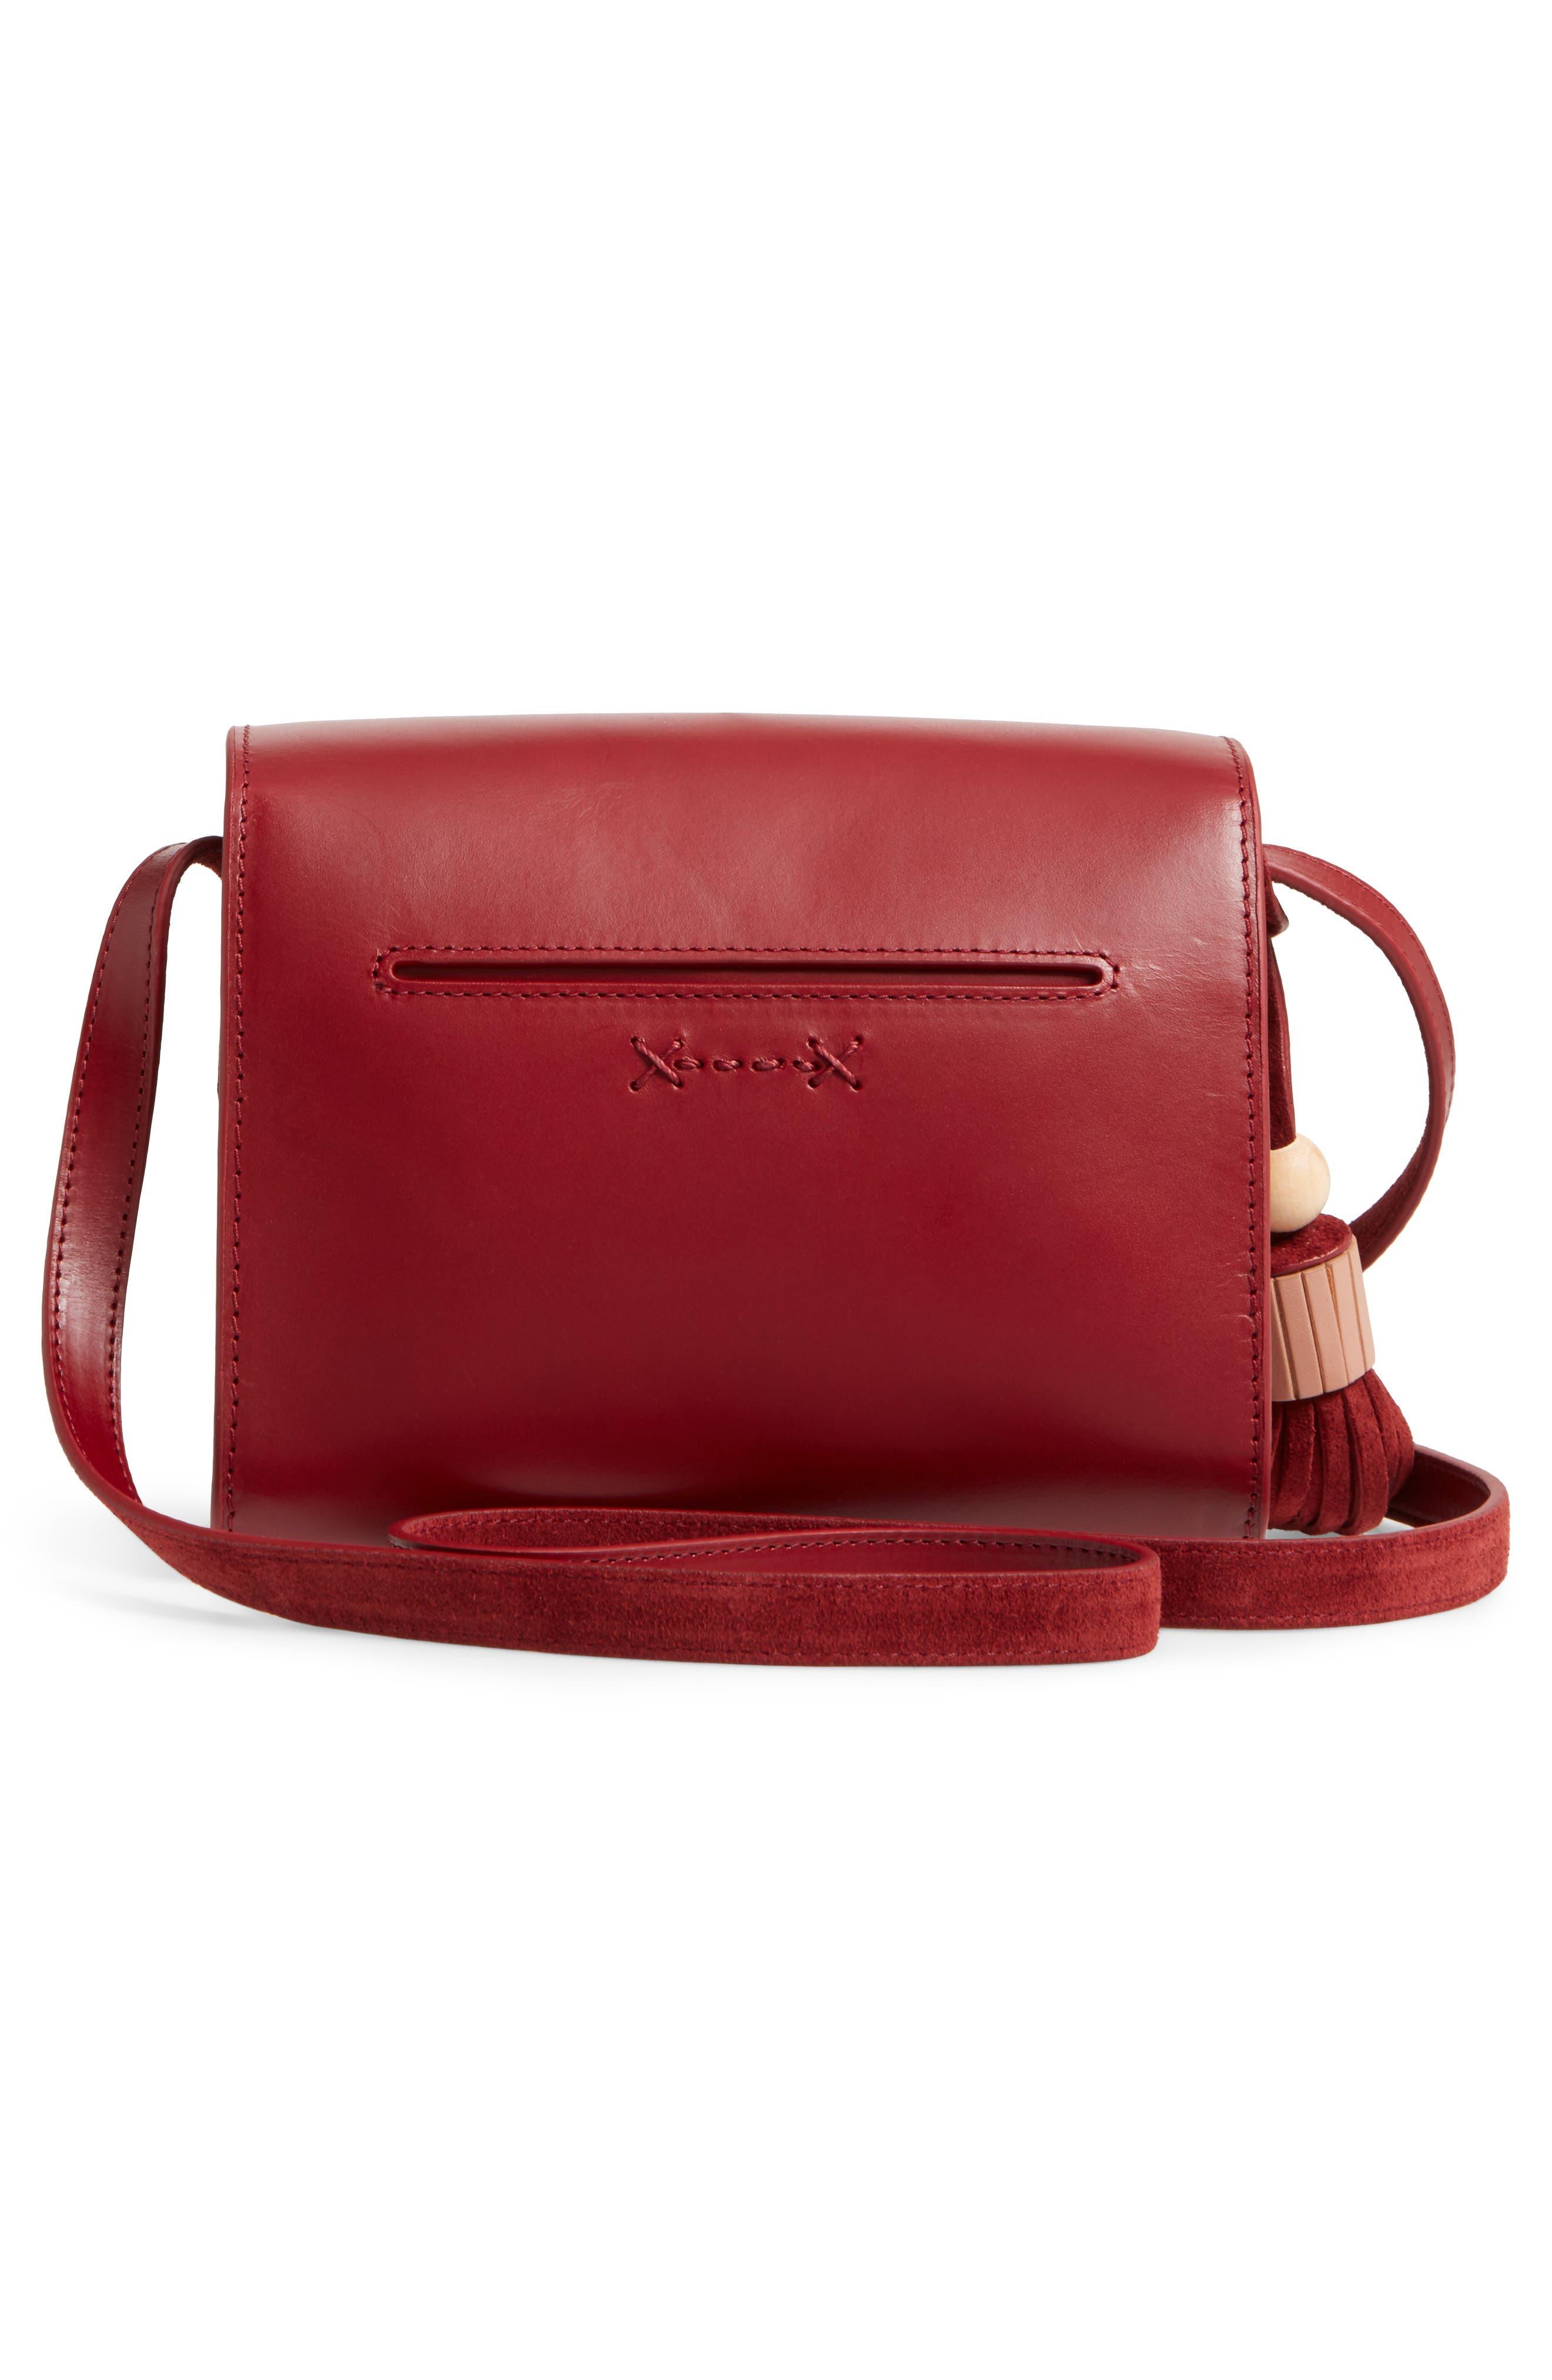 Eloise Field Crossbody Bag,                             Alternate thumbnail 3, color,                             612